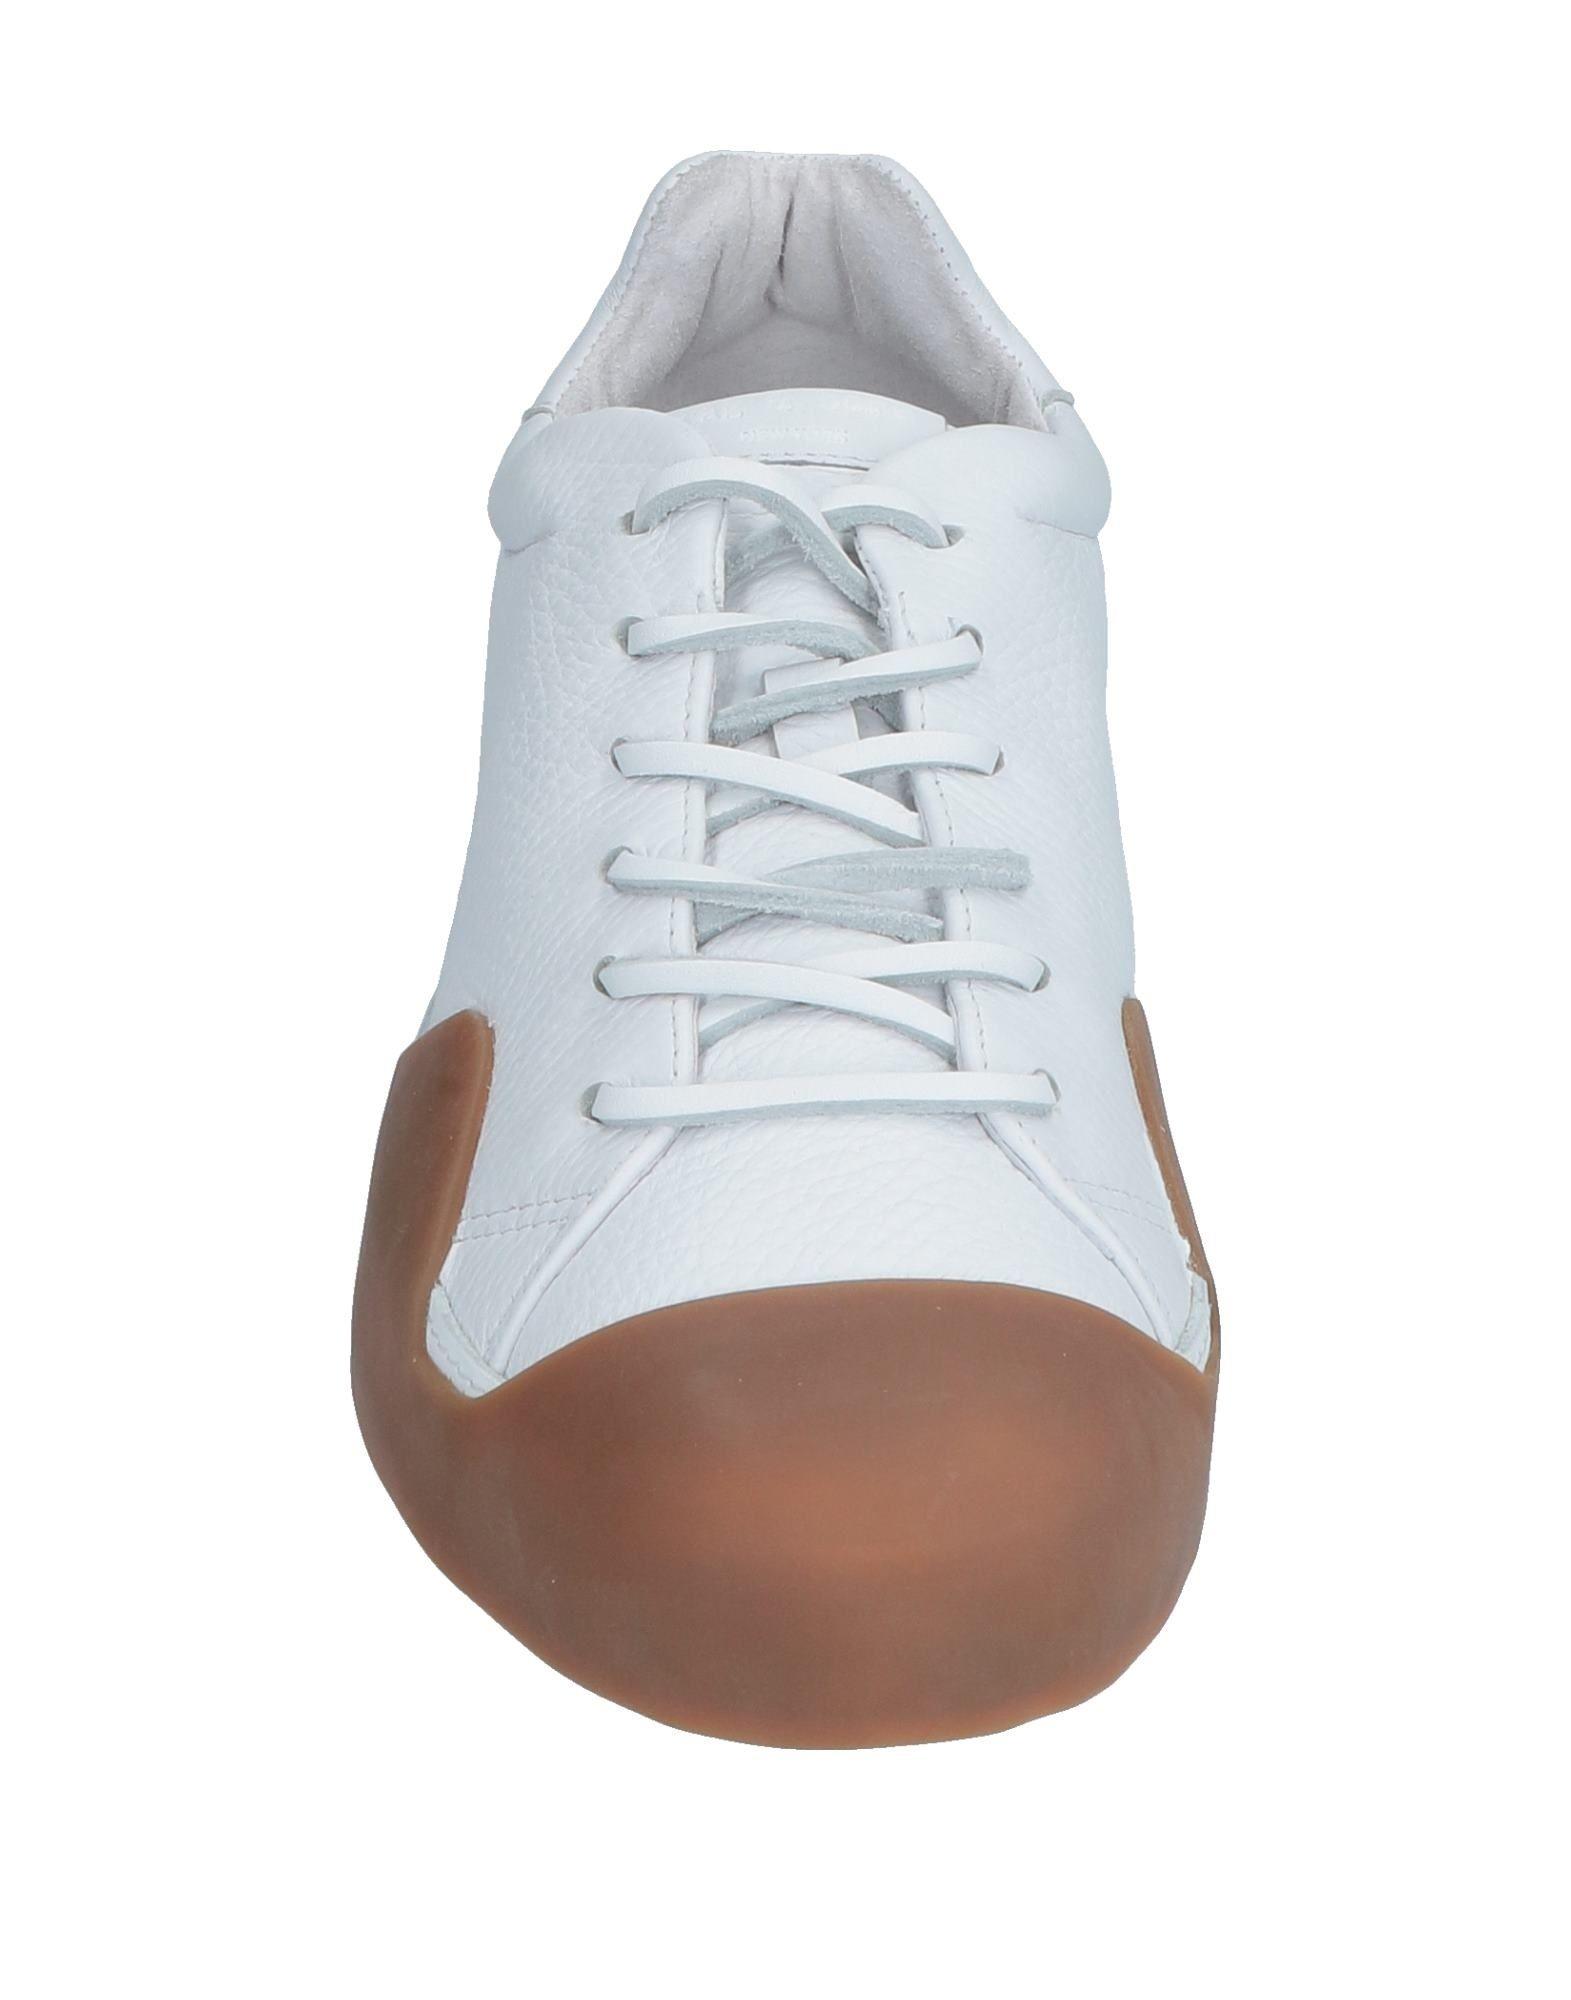 Rag & Bone Gute Sneakers Herren  11572485HW Gute Bone Qualität beliebte Schuhe 567591